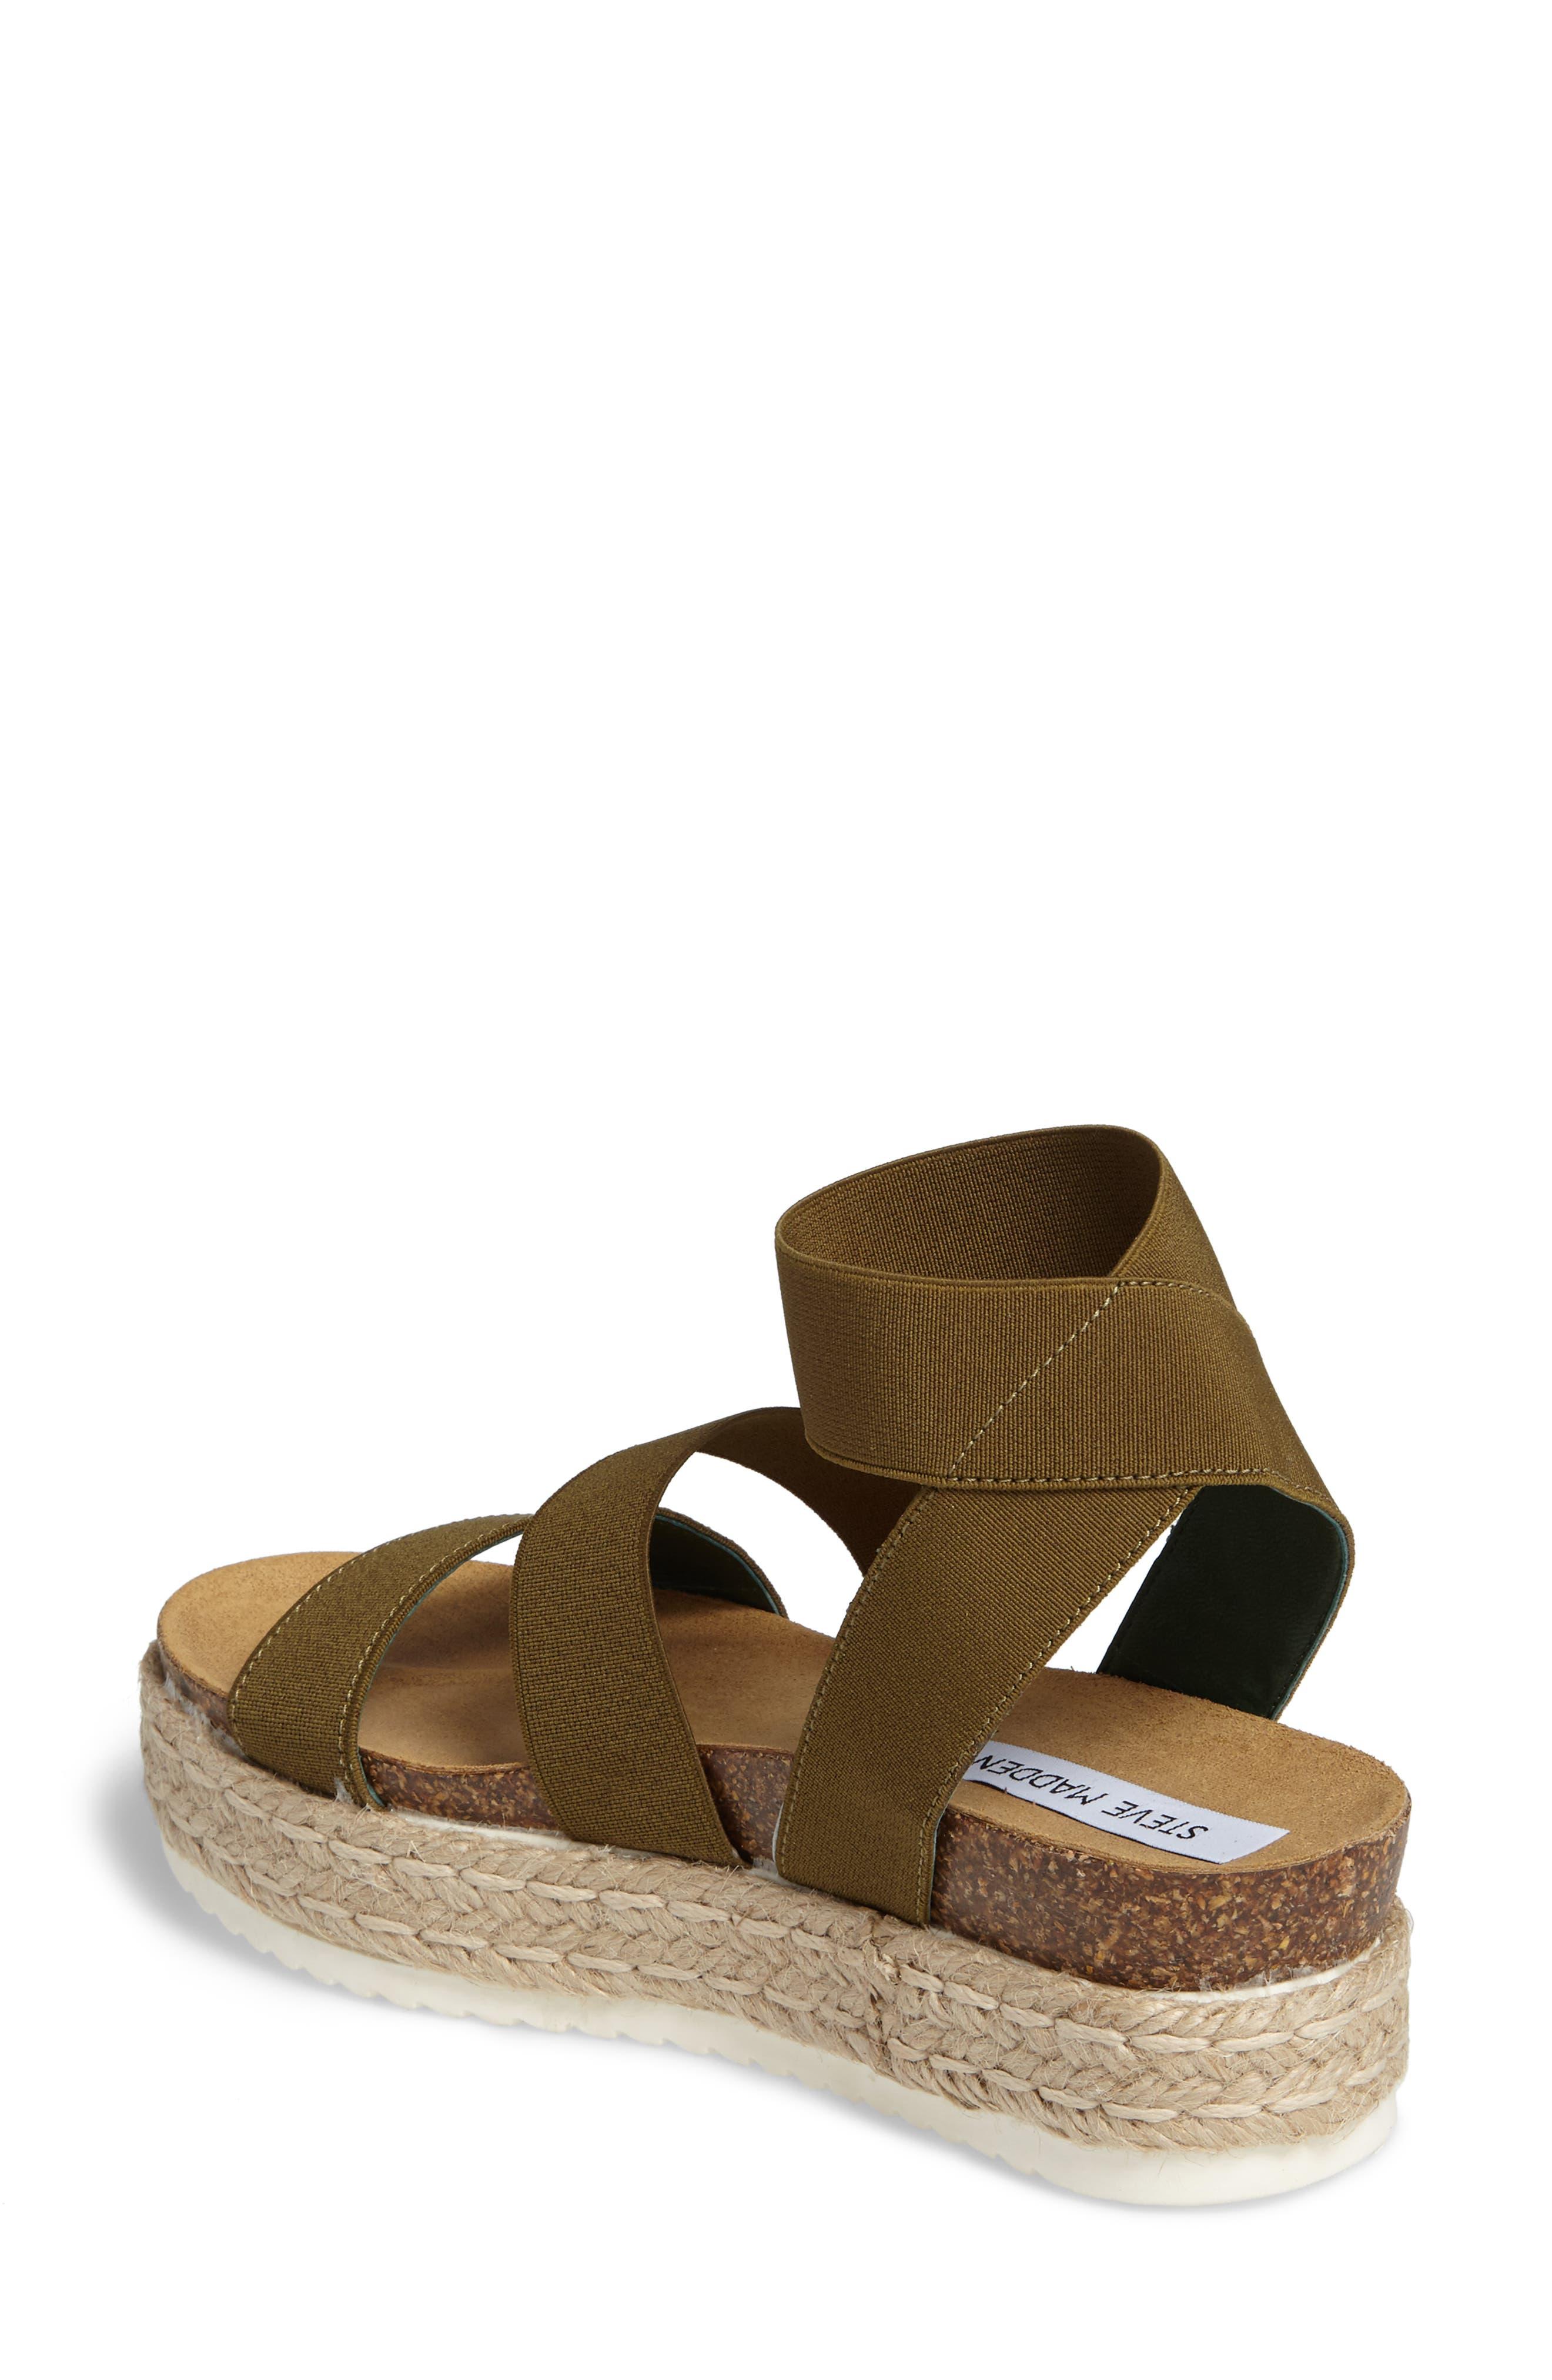 Kimmie Flatform Sandal,                             Alternate thumbnail 6, color,